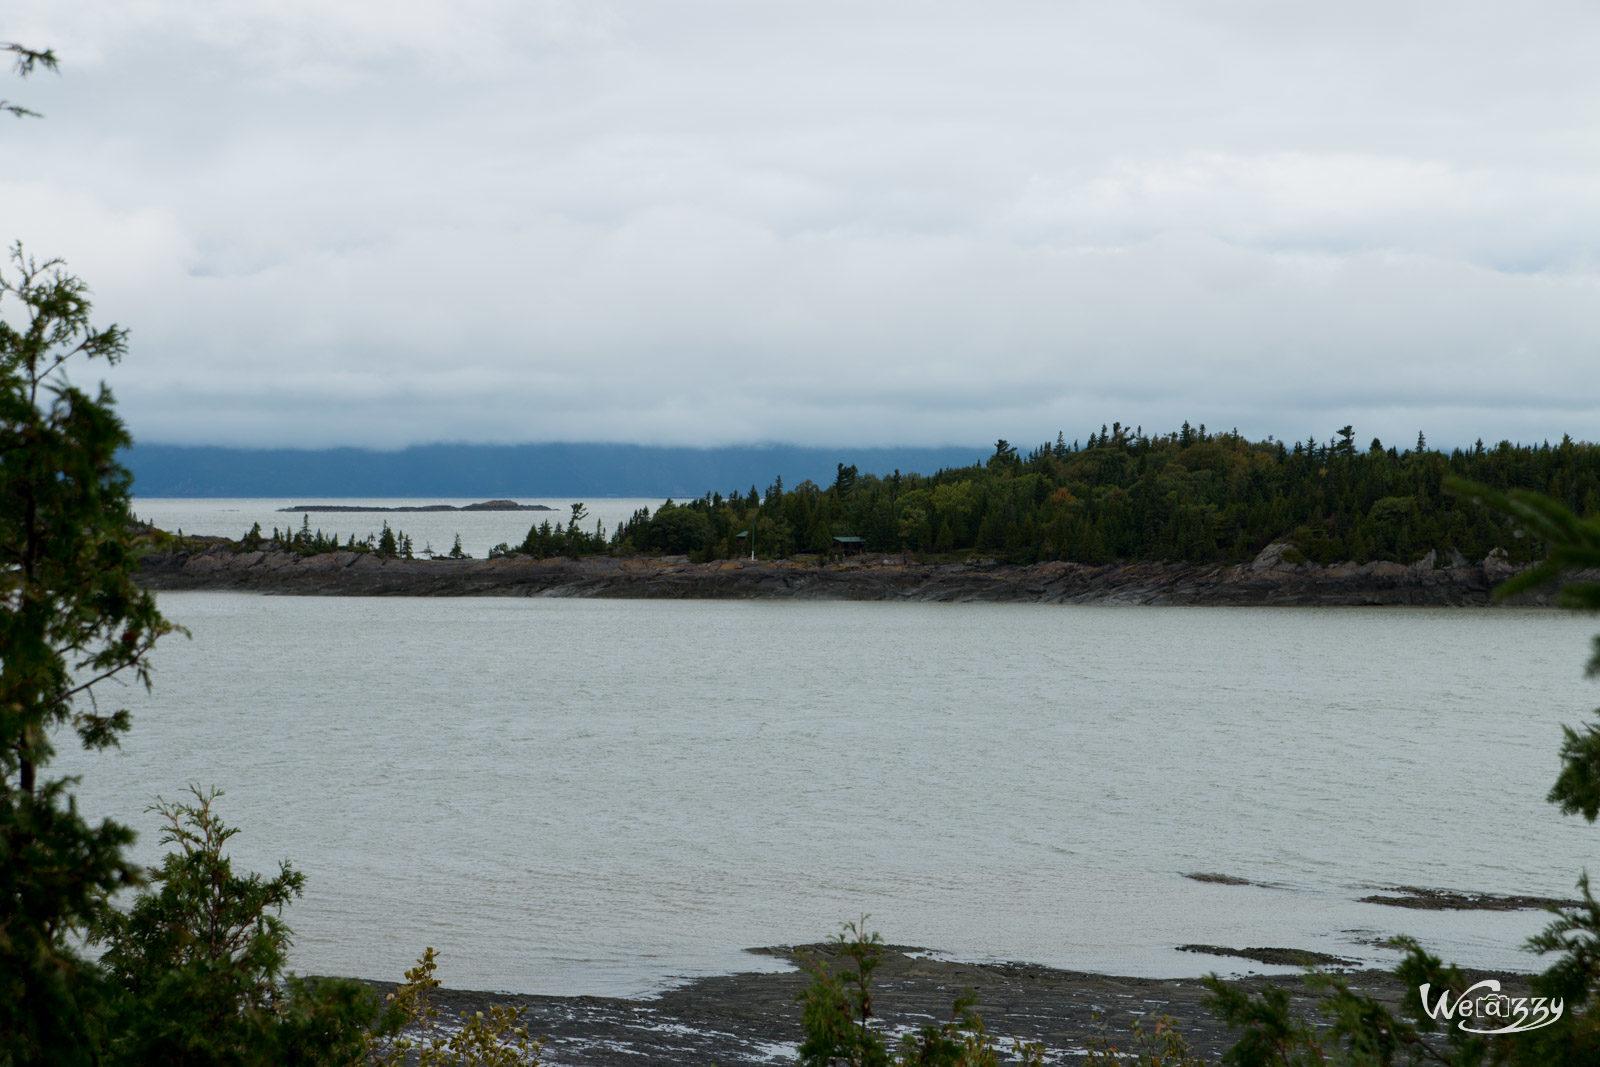 Canada, Ile, Ile aux grues, Island, Montmagny, Québec, Voyage